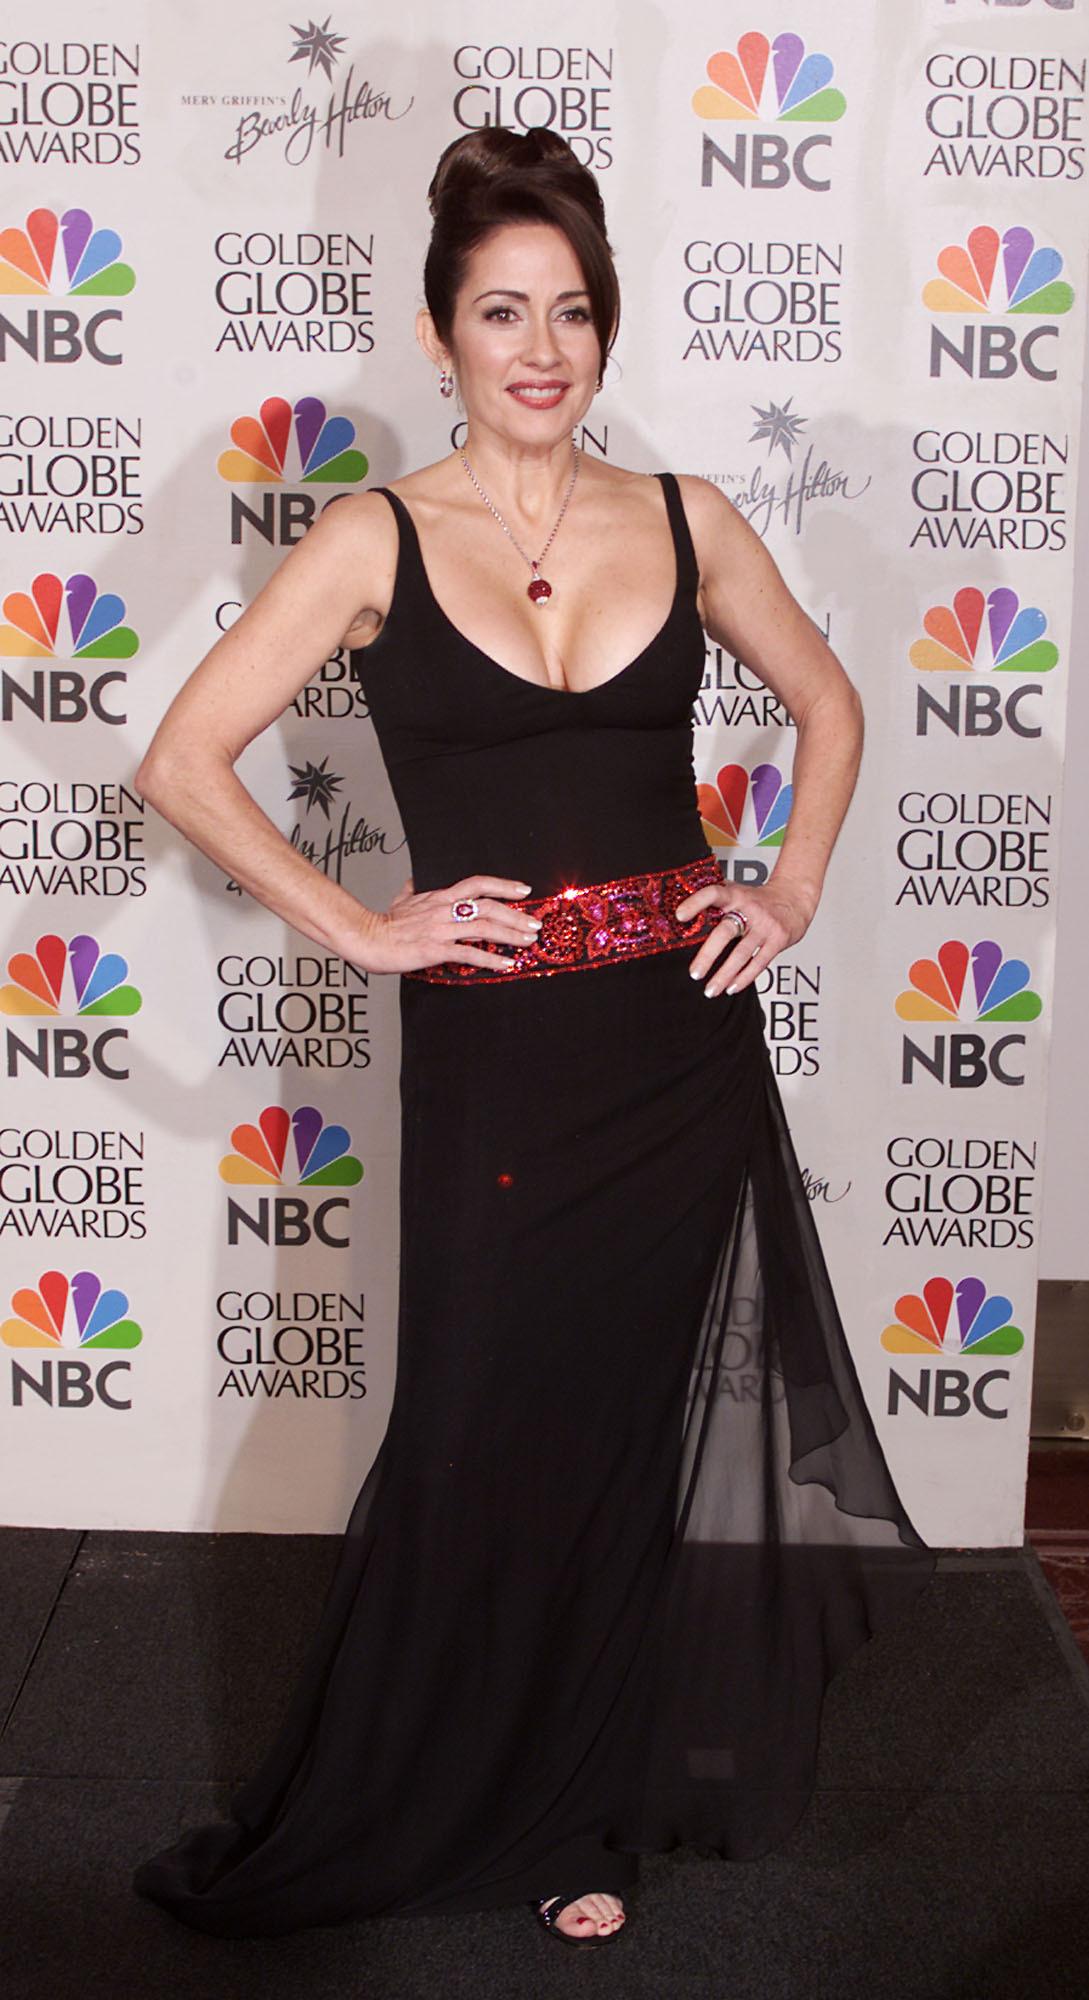 Patricia Heaton hot look pic